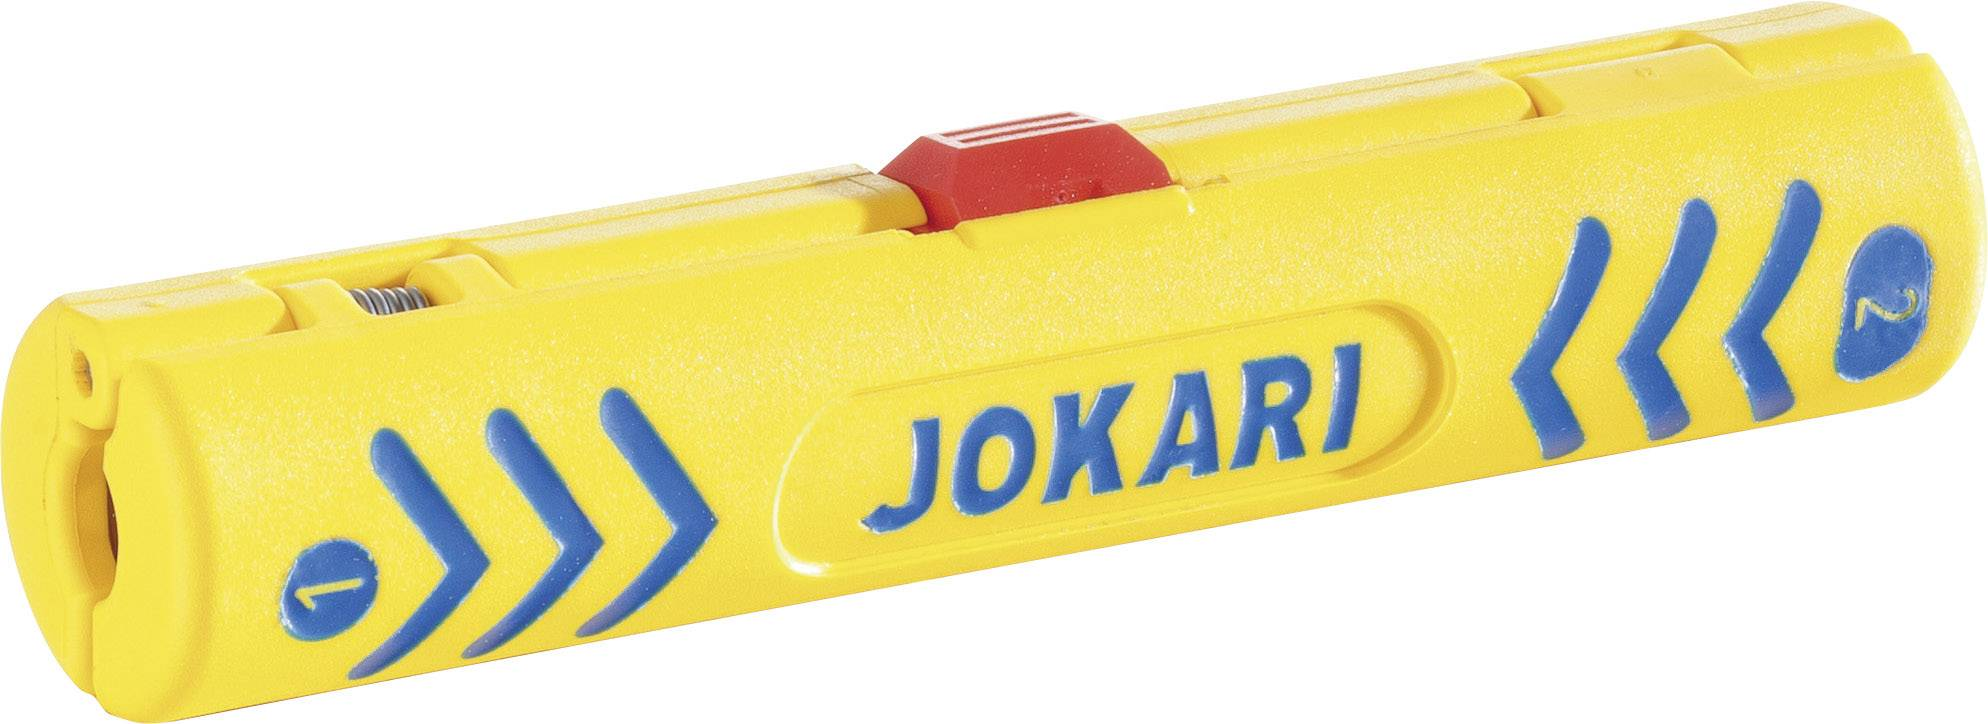 Odizolovač Jokari Secura Coaxi No.1 30600, 4.8 do 7.5 mm